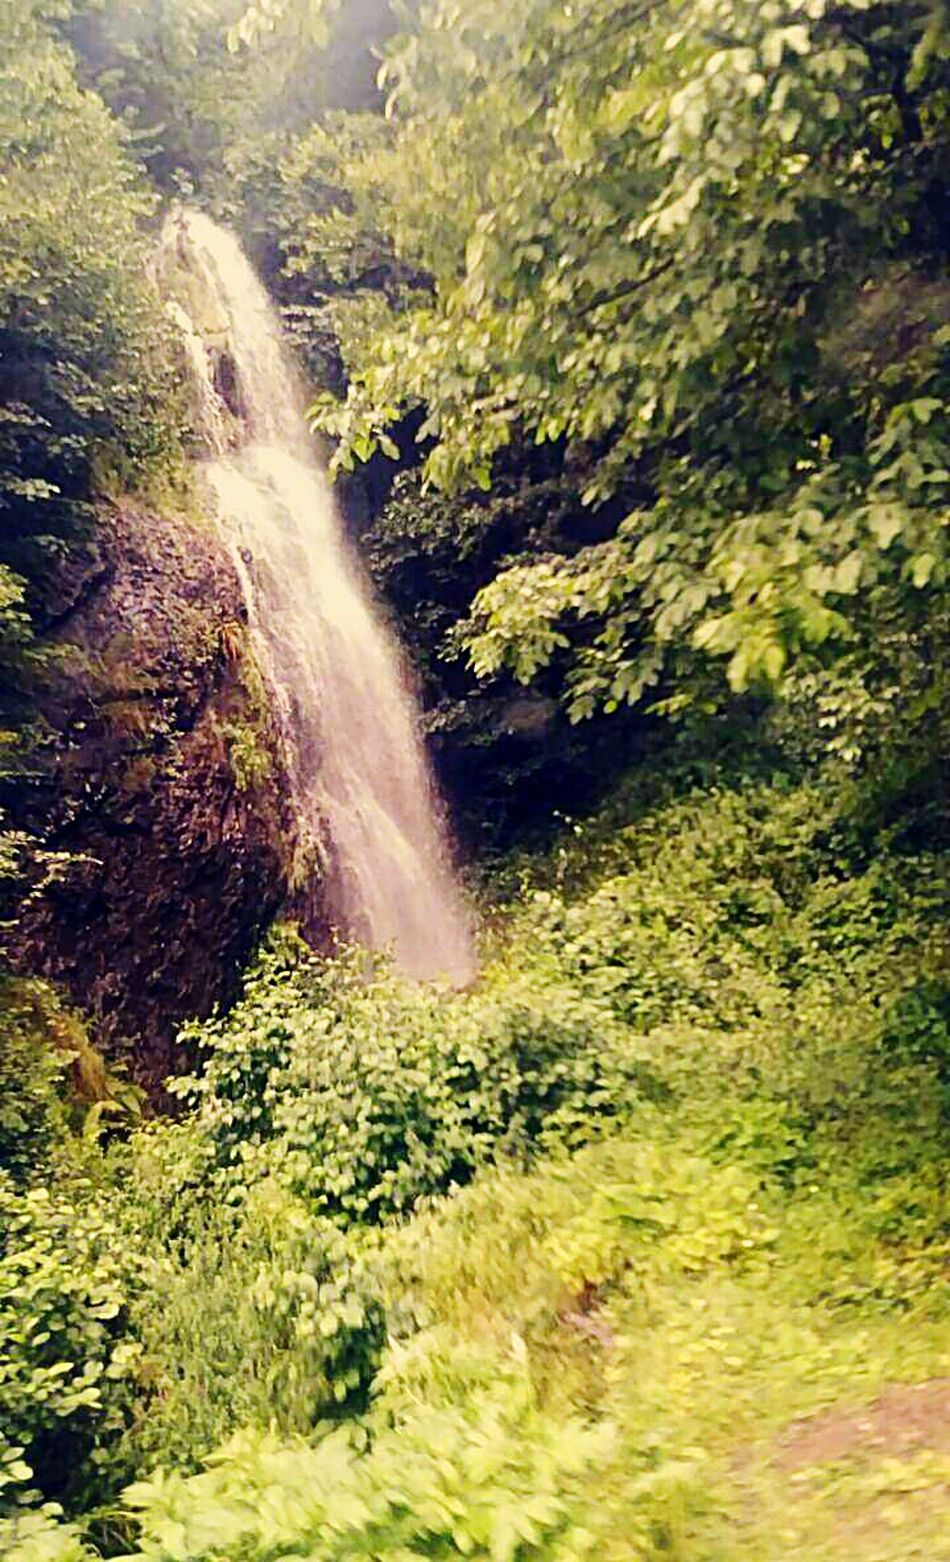 Waterfall... Waterfall Rain Rainy RainyDayPerfect GoodJob Intsagood Instaperfect First Eyeem Photo